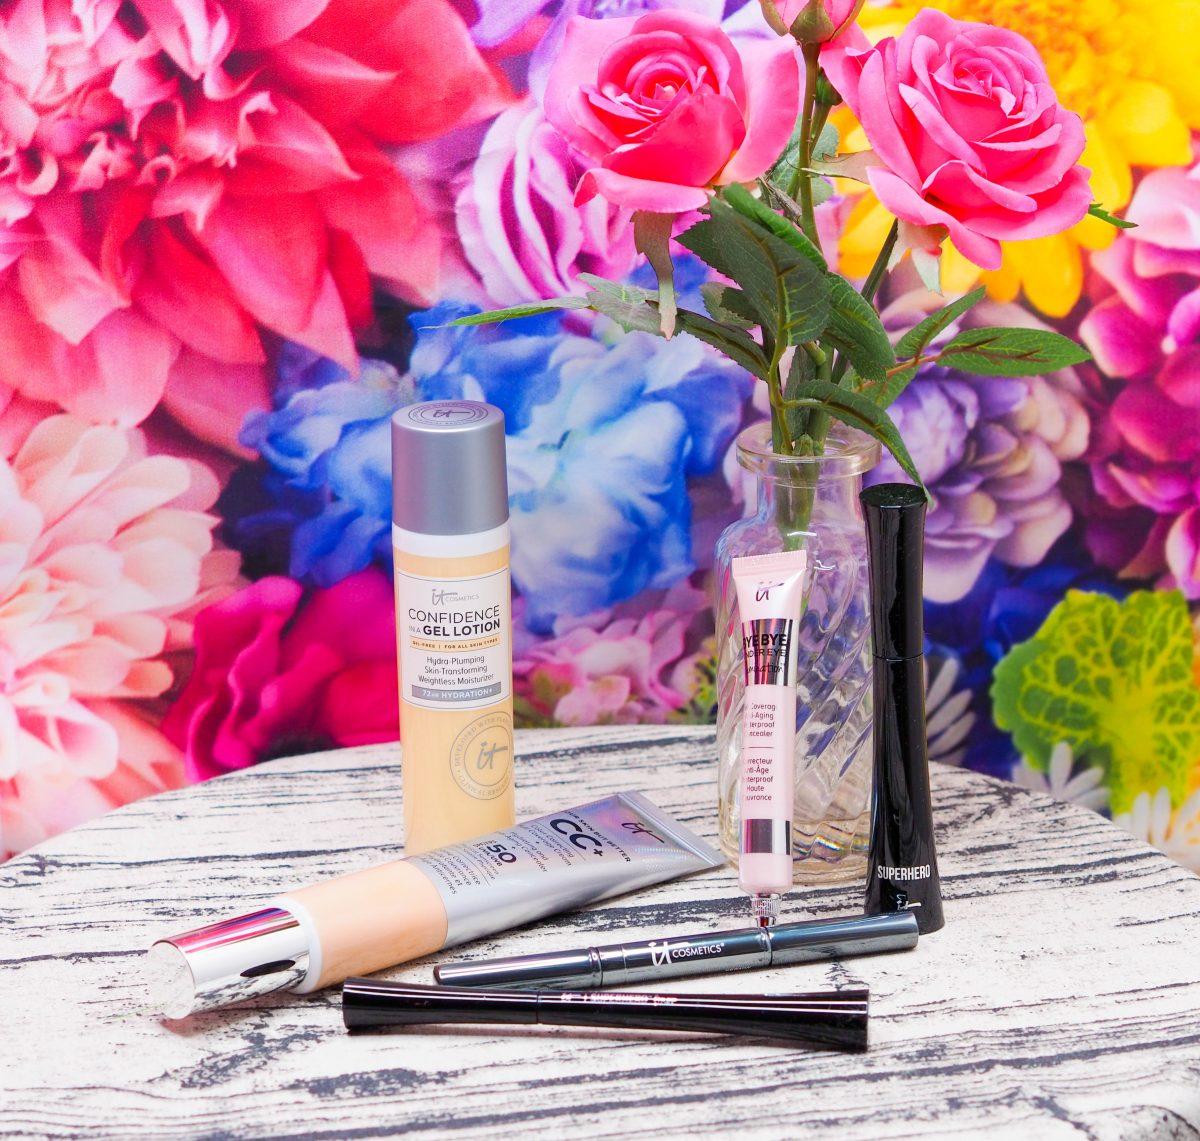 IT Cosmetics at QVC UK